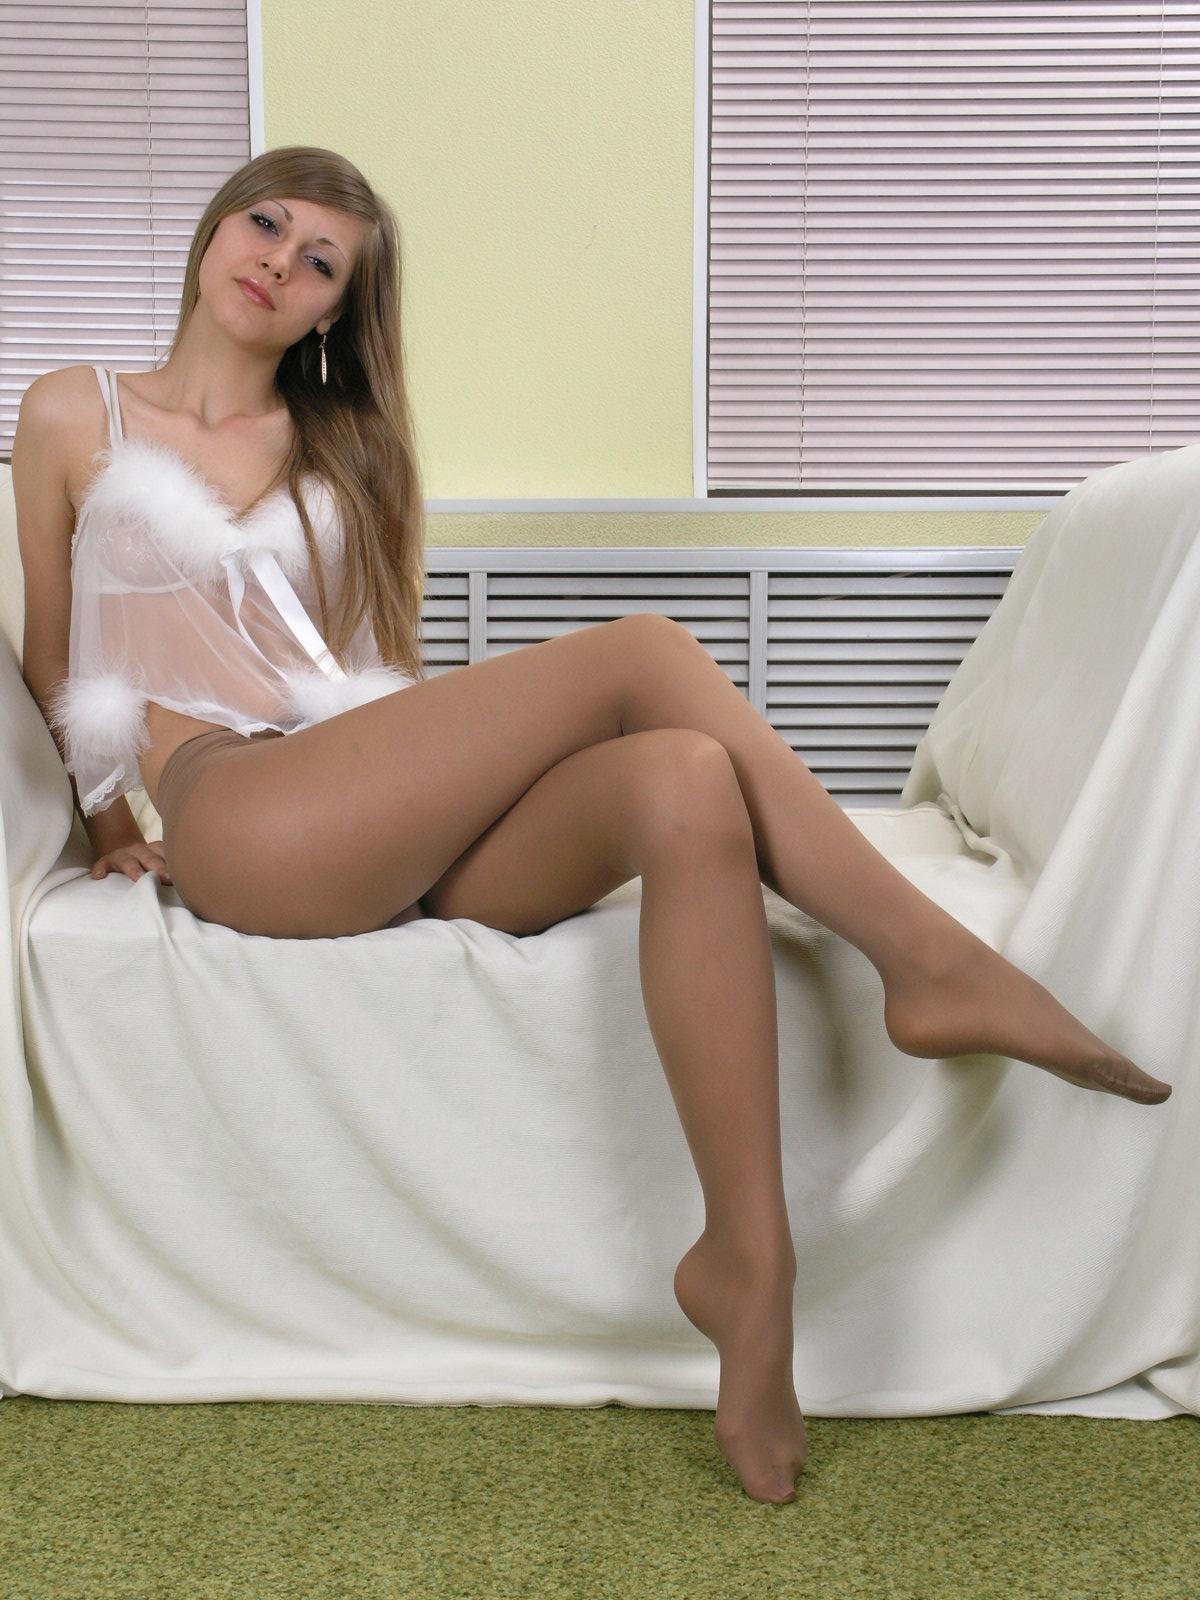 Vladmodels Irina Topless | MEJOR CONJUNTO DE FRASES: www.apexwallpapers.com/wiki/vladmodels-irina-topless.html